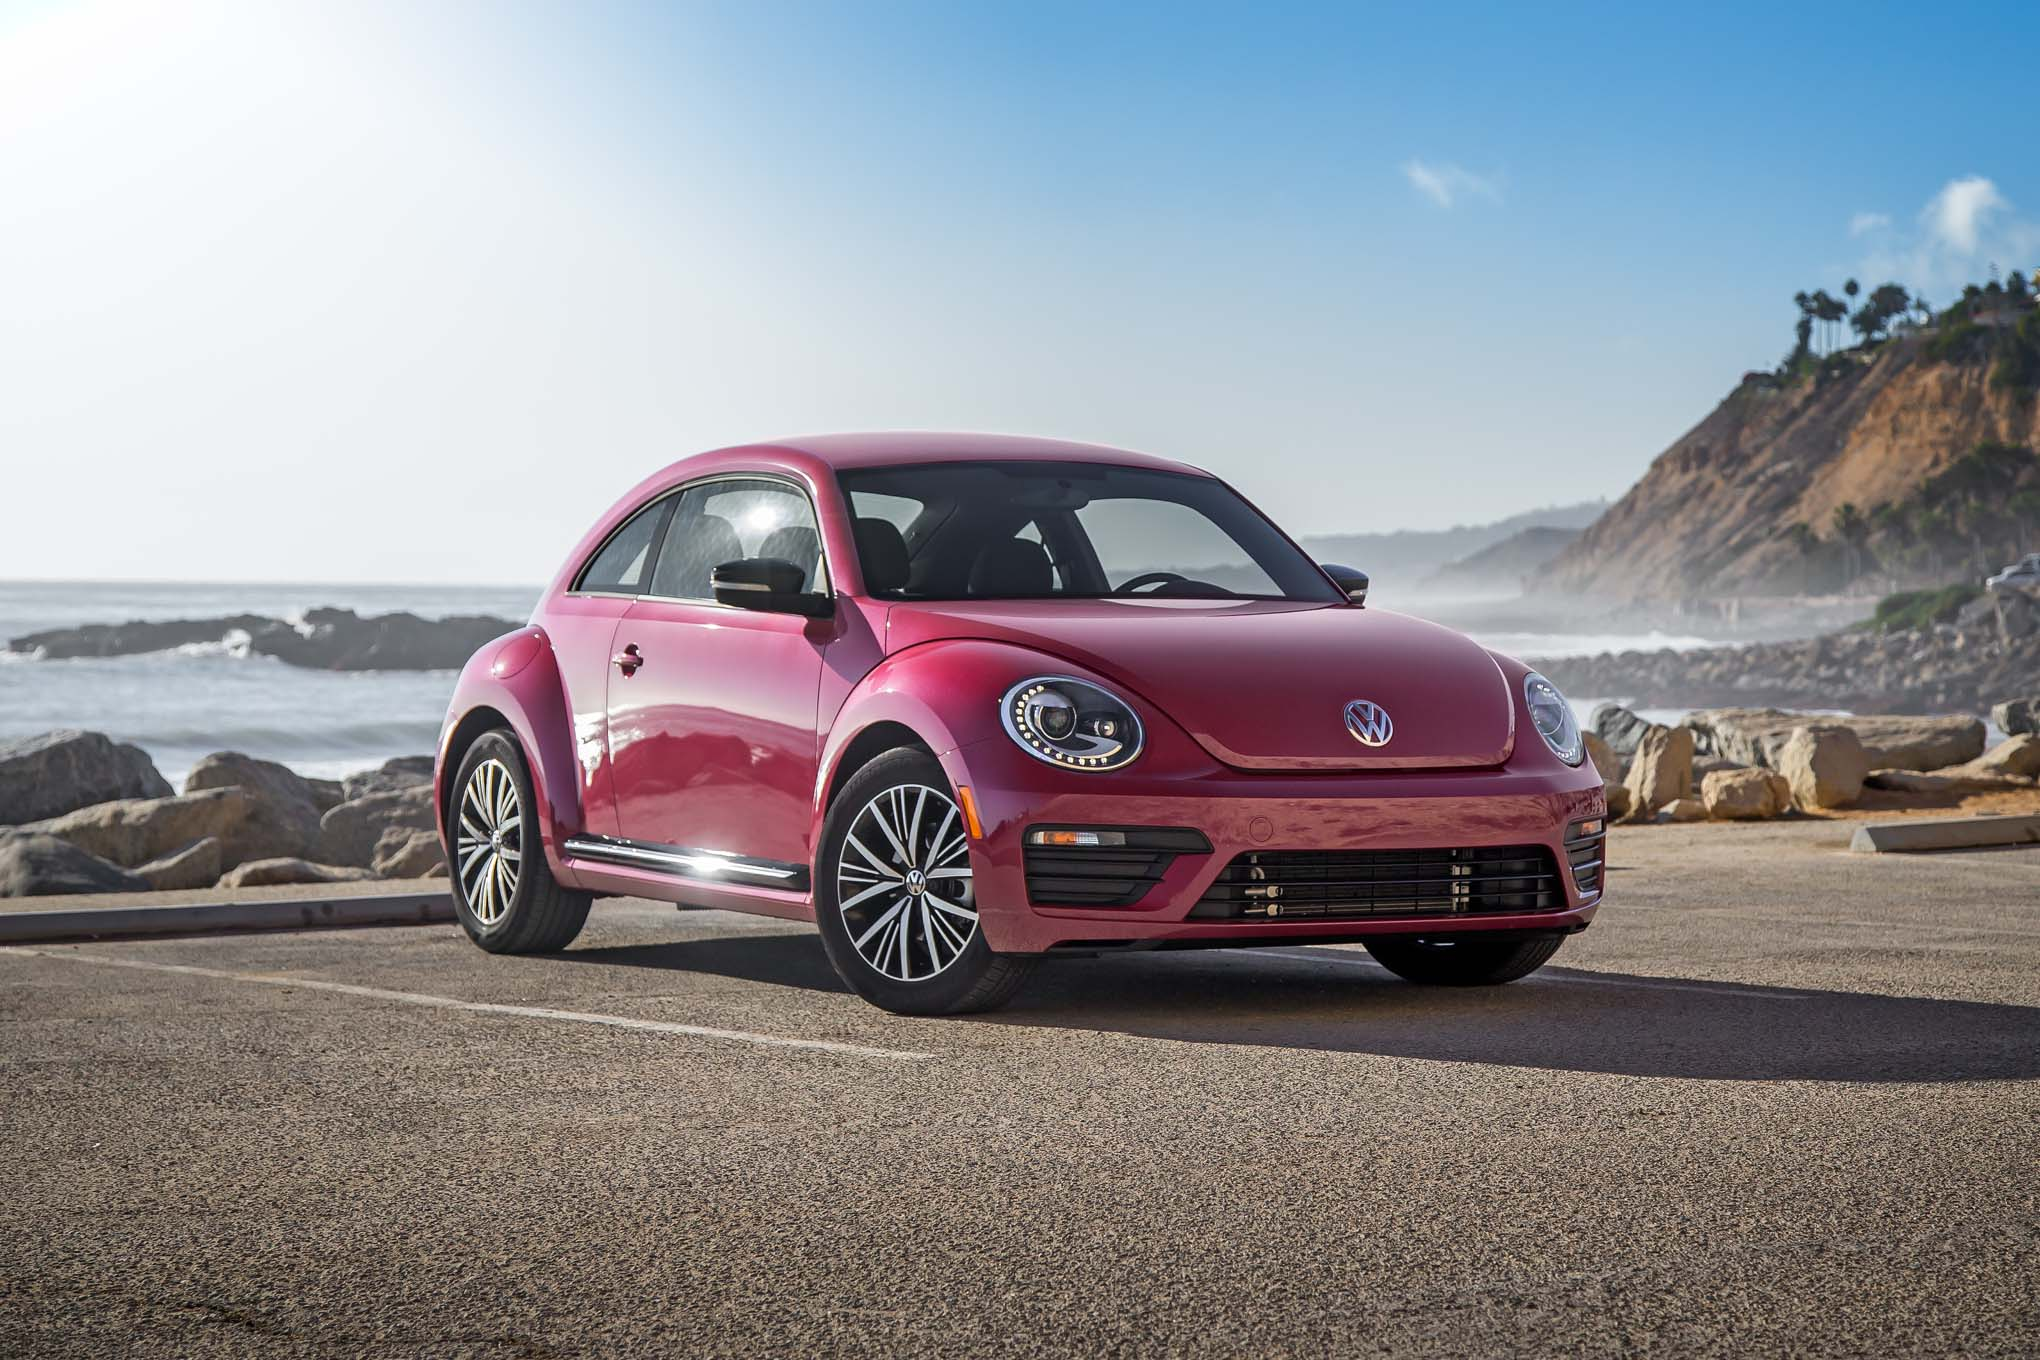 7 Datos Interesantes Sobre El Volkswagen Pinkbeetle 2017